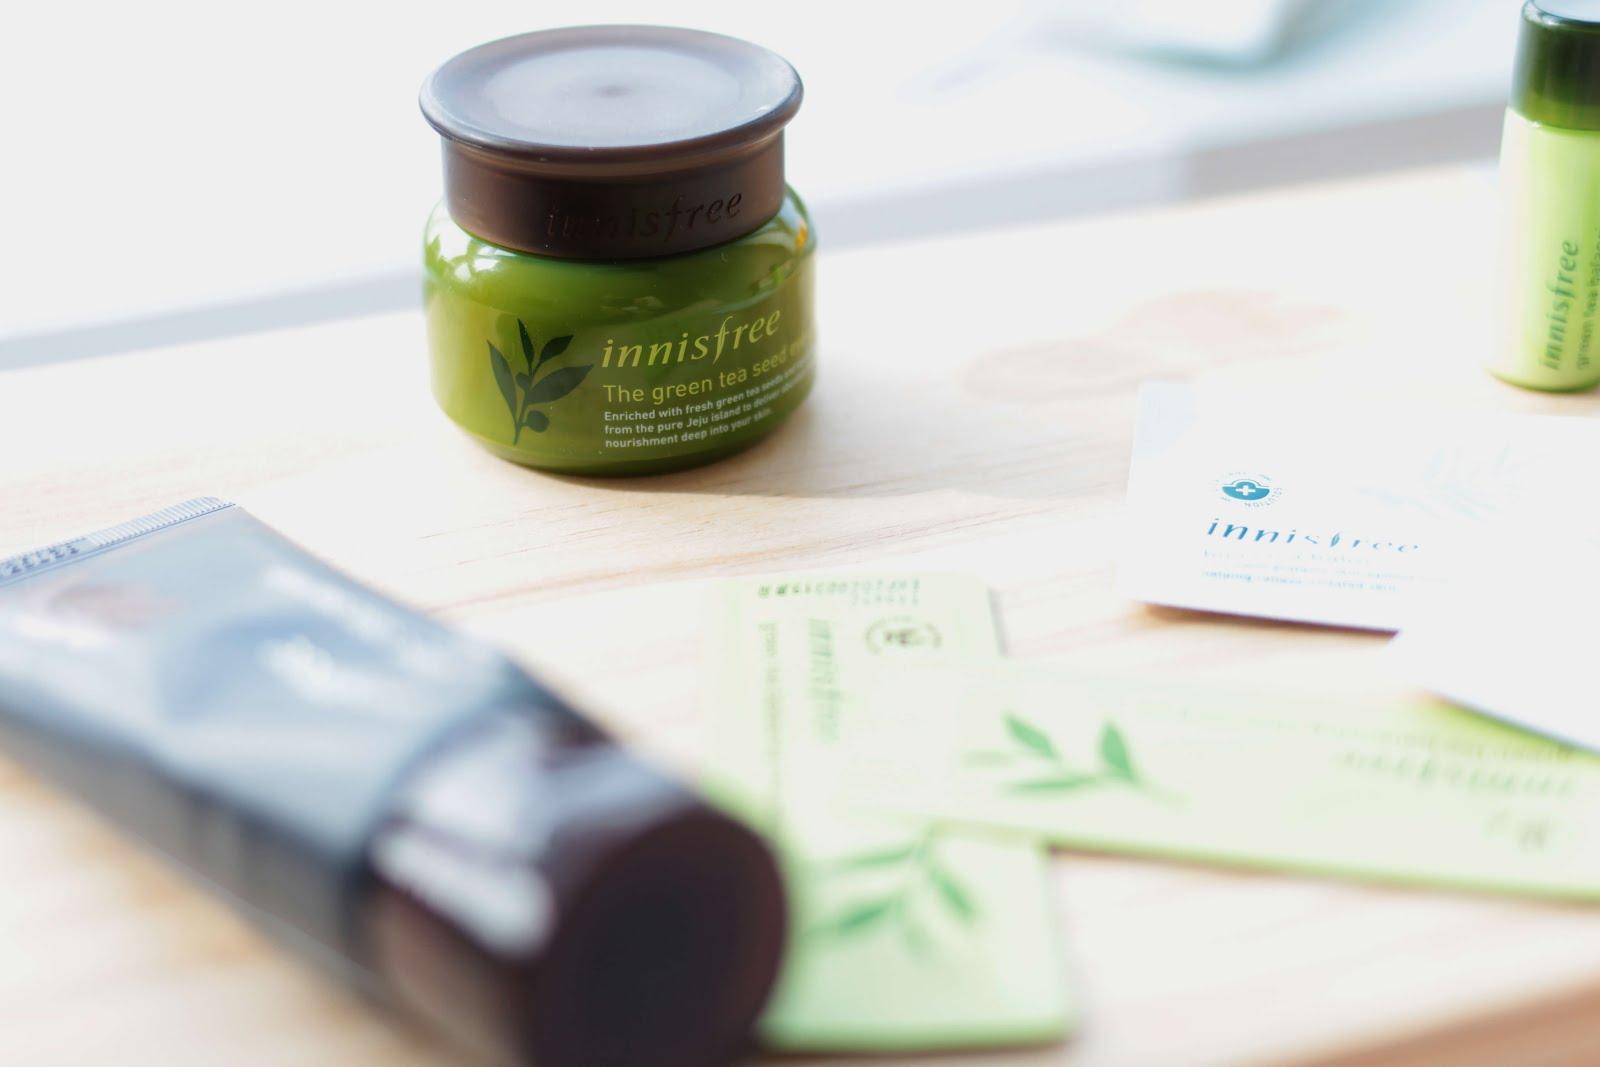 Collective Korean Skincare Haul Innisfree The Face Shop Cosrx Green Tea Seed Eye Cream